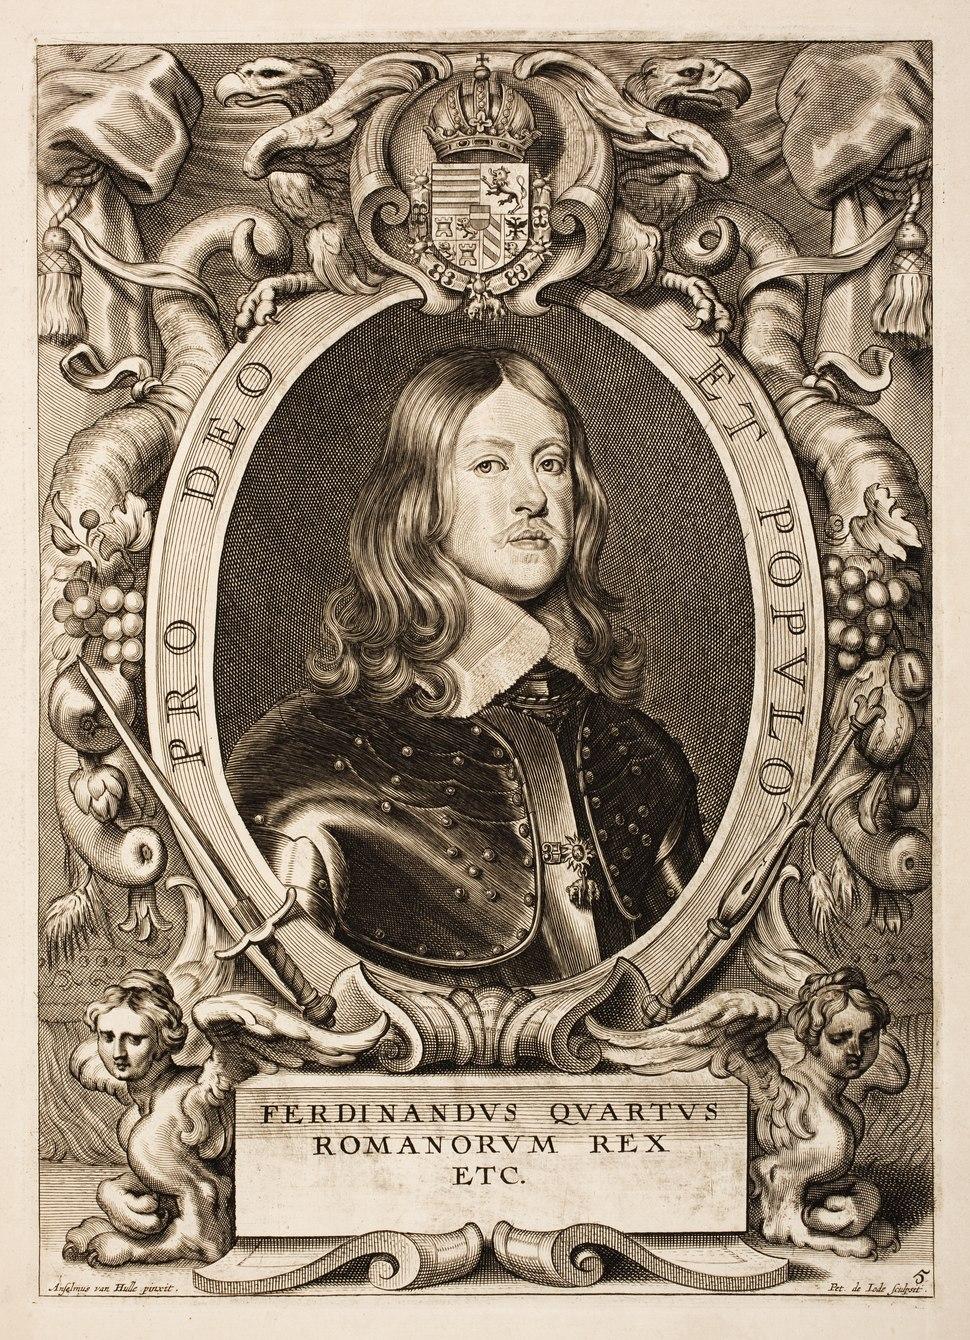 Anselmus-van-Hulle-Hommes-illustres MG 0432